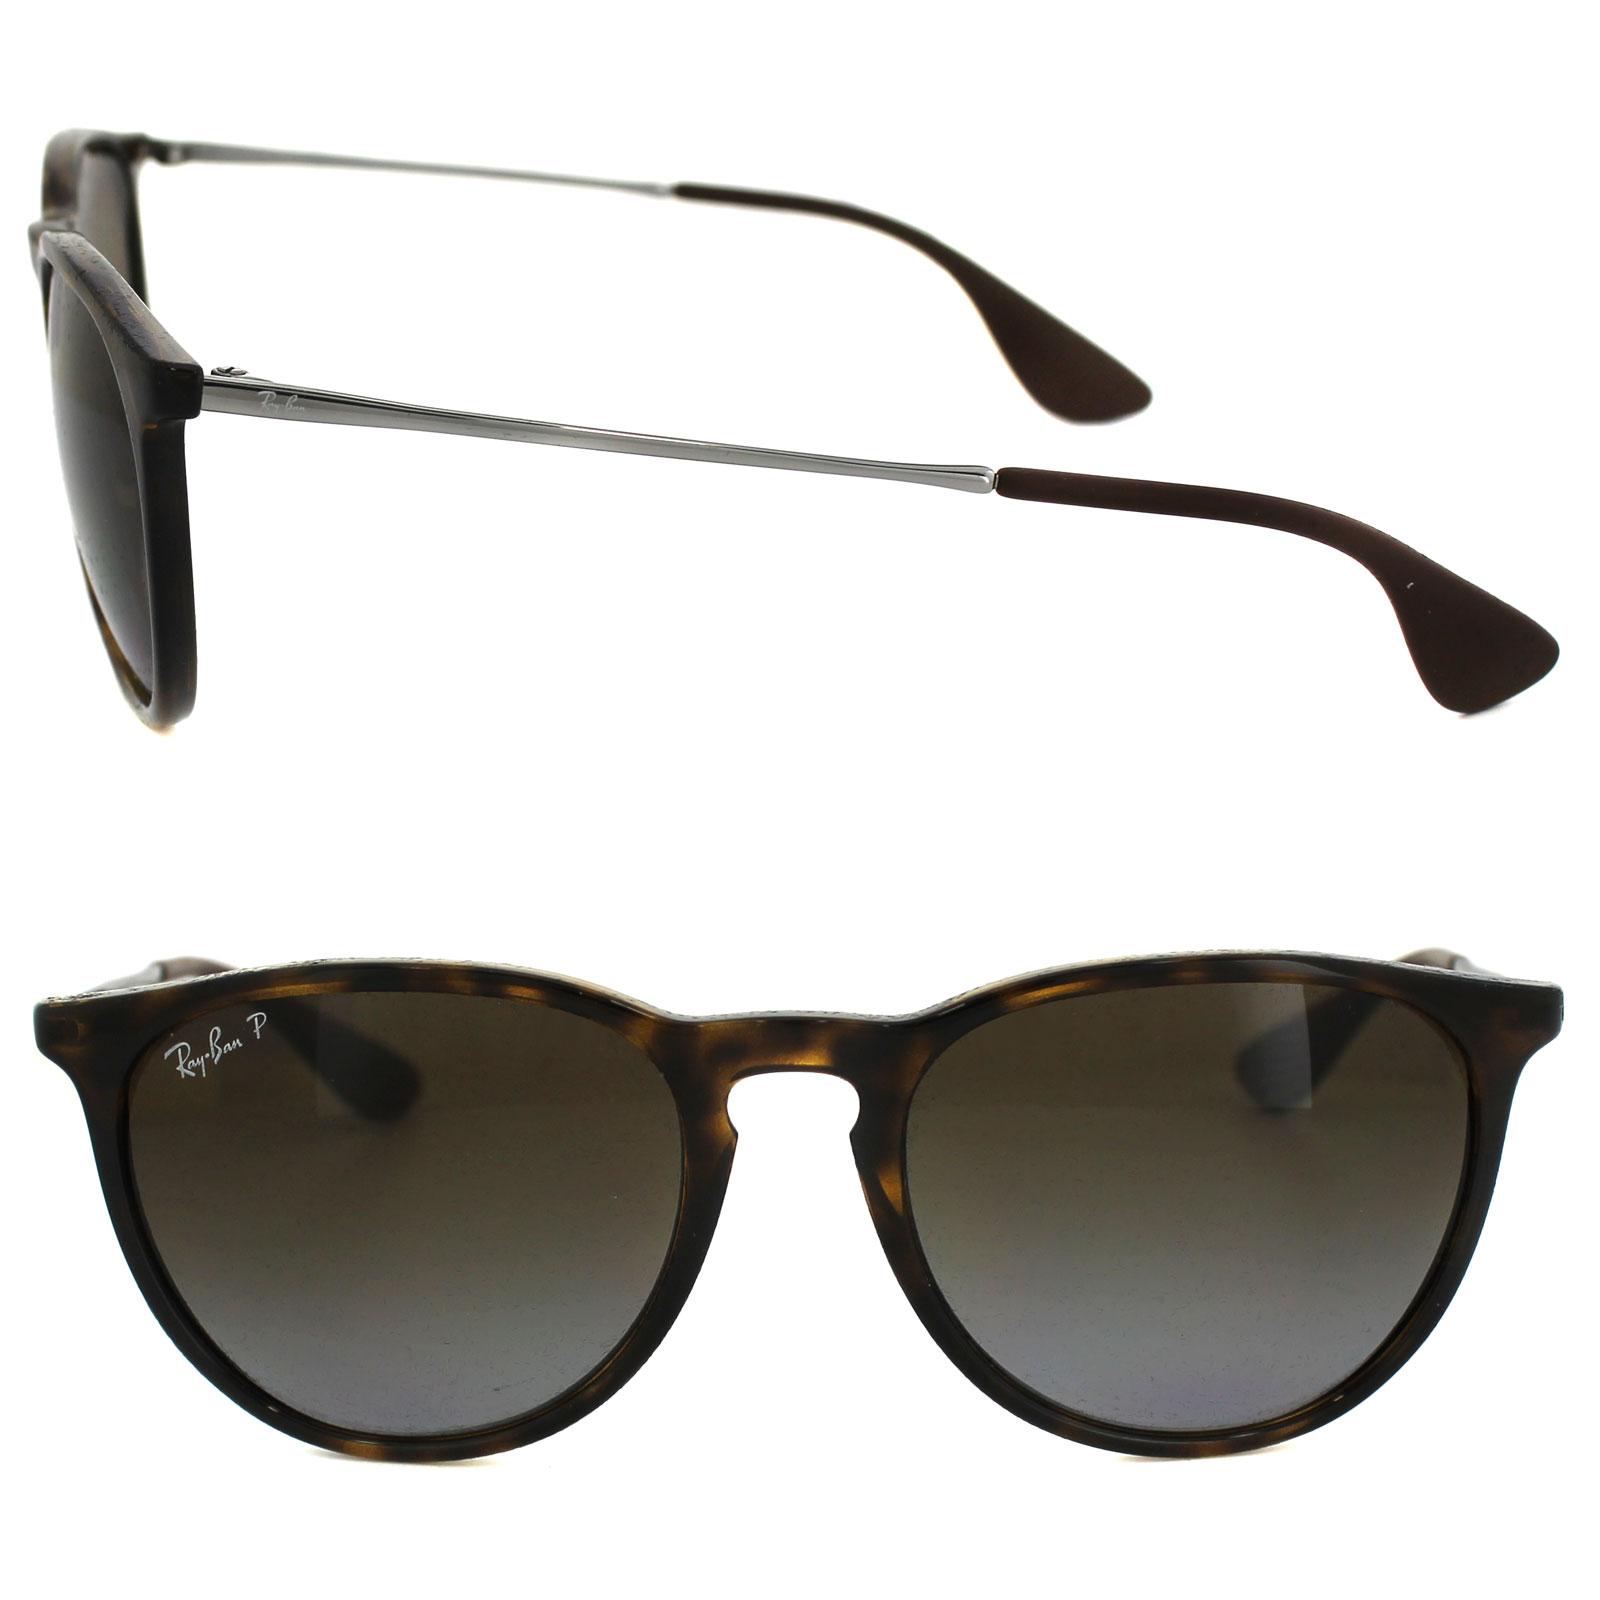 4621ae89f3257 Sentinel Ray-Ban Sunglasses Erika 4171 710 T5 Tortoise Gunmetal Brown  Gradient Polarized